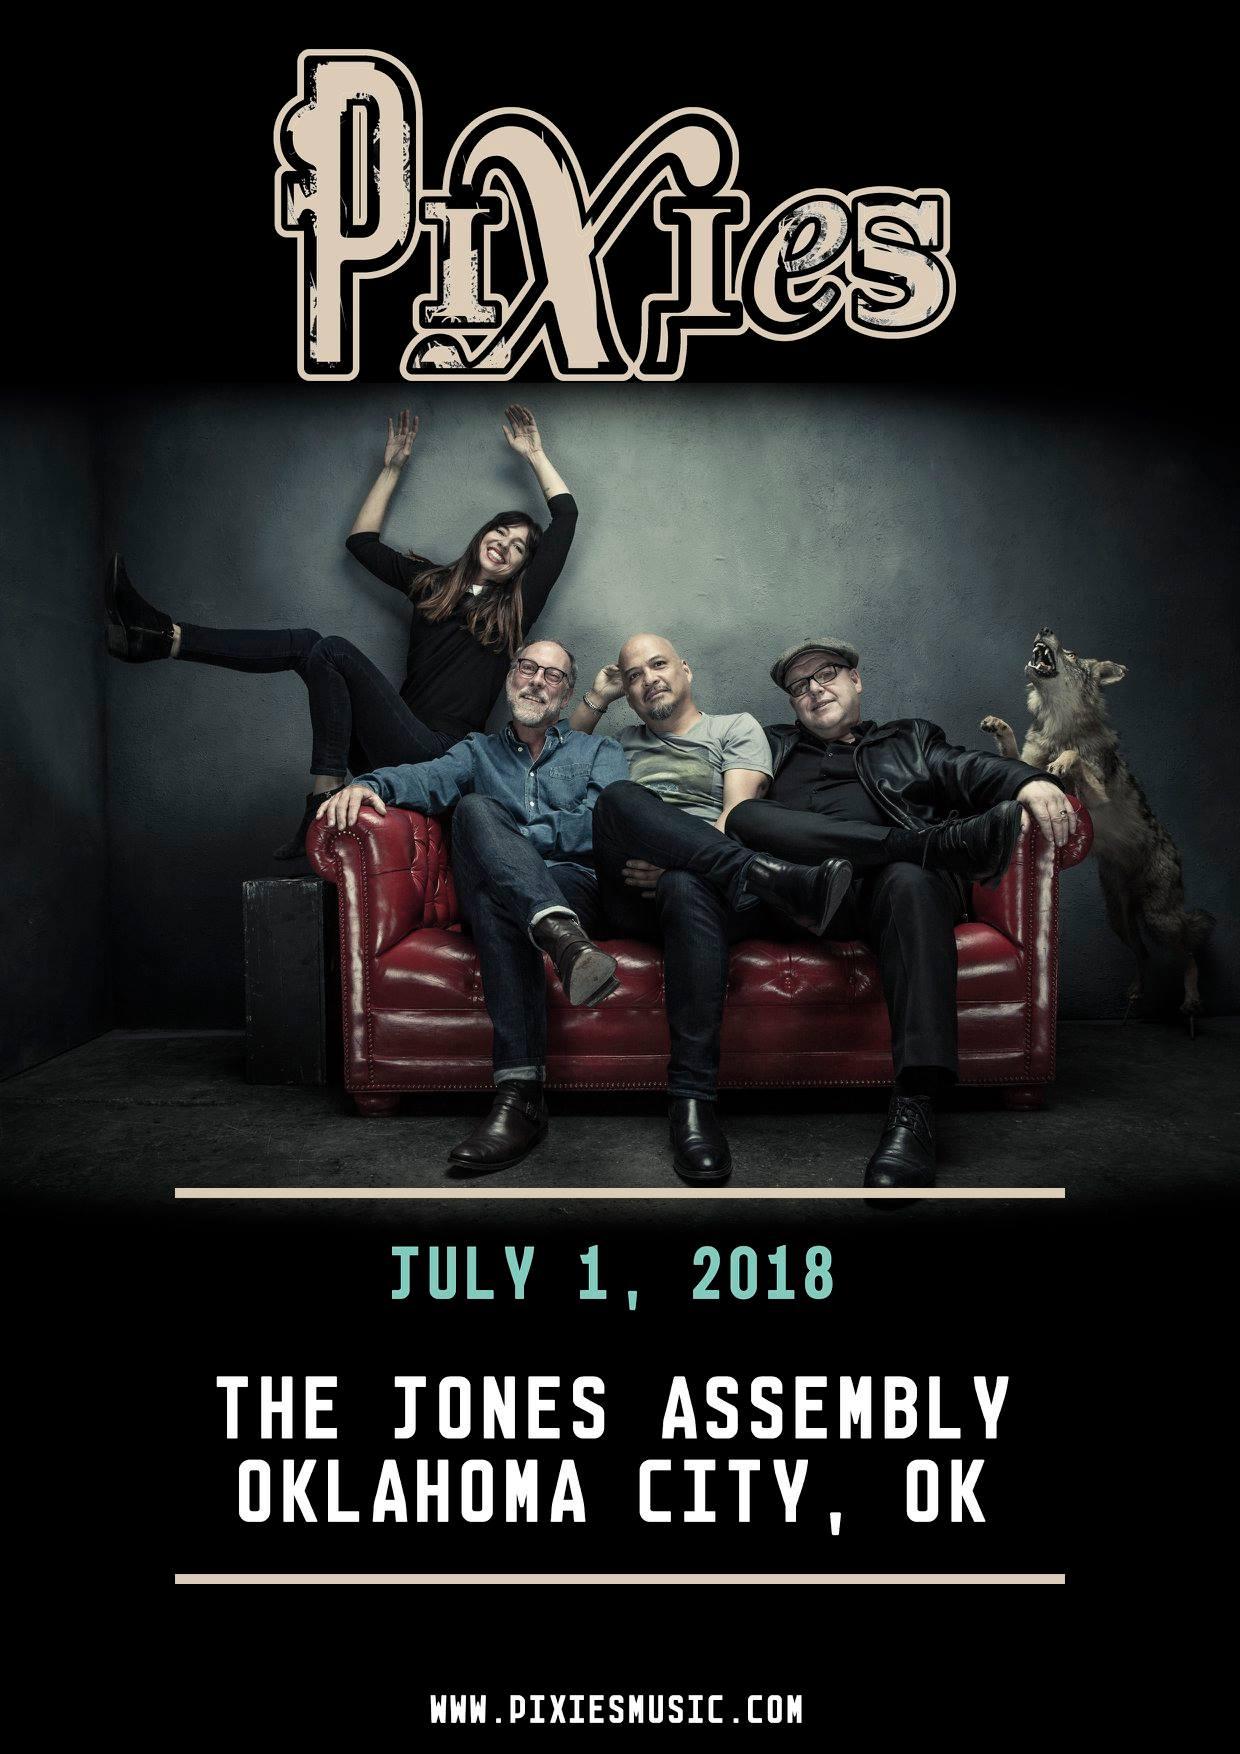 OKLAHOMA CITY, OK - we play @theJonesOKC on July 1st. Tickets are on-sale NOW at: https://t.co/NTOnjBD0Ao https://t.co/hom6tkpyRM